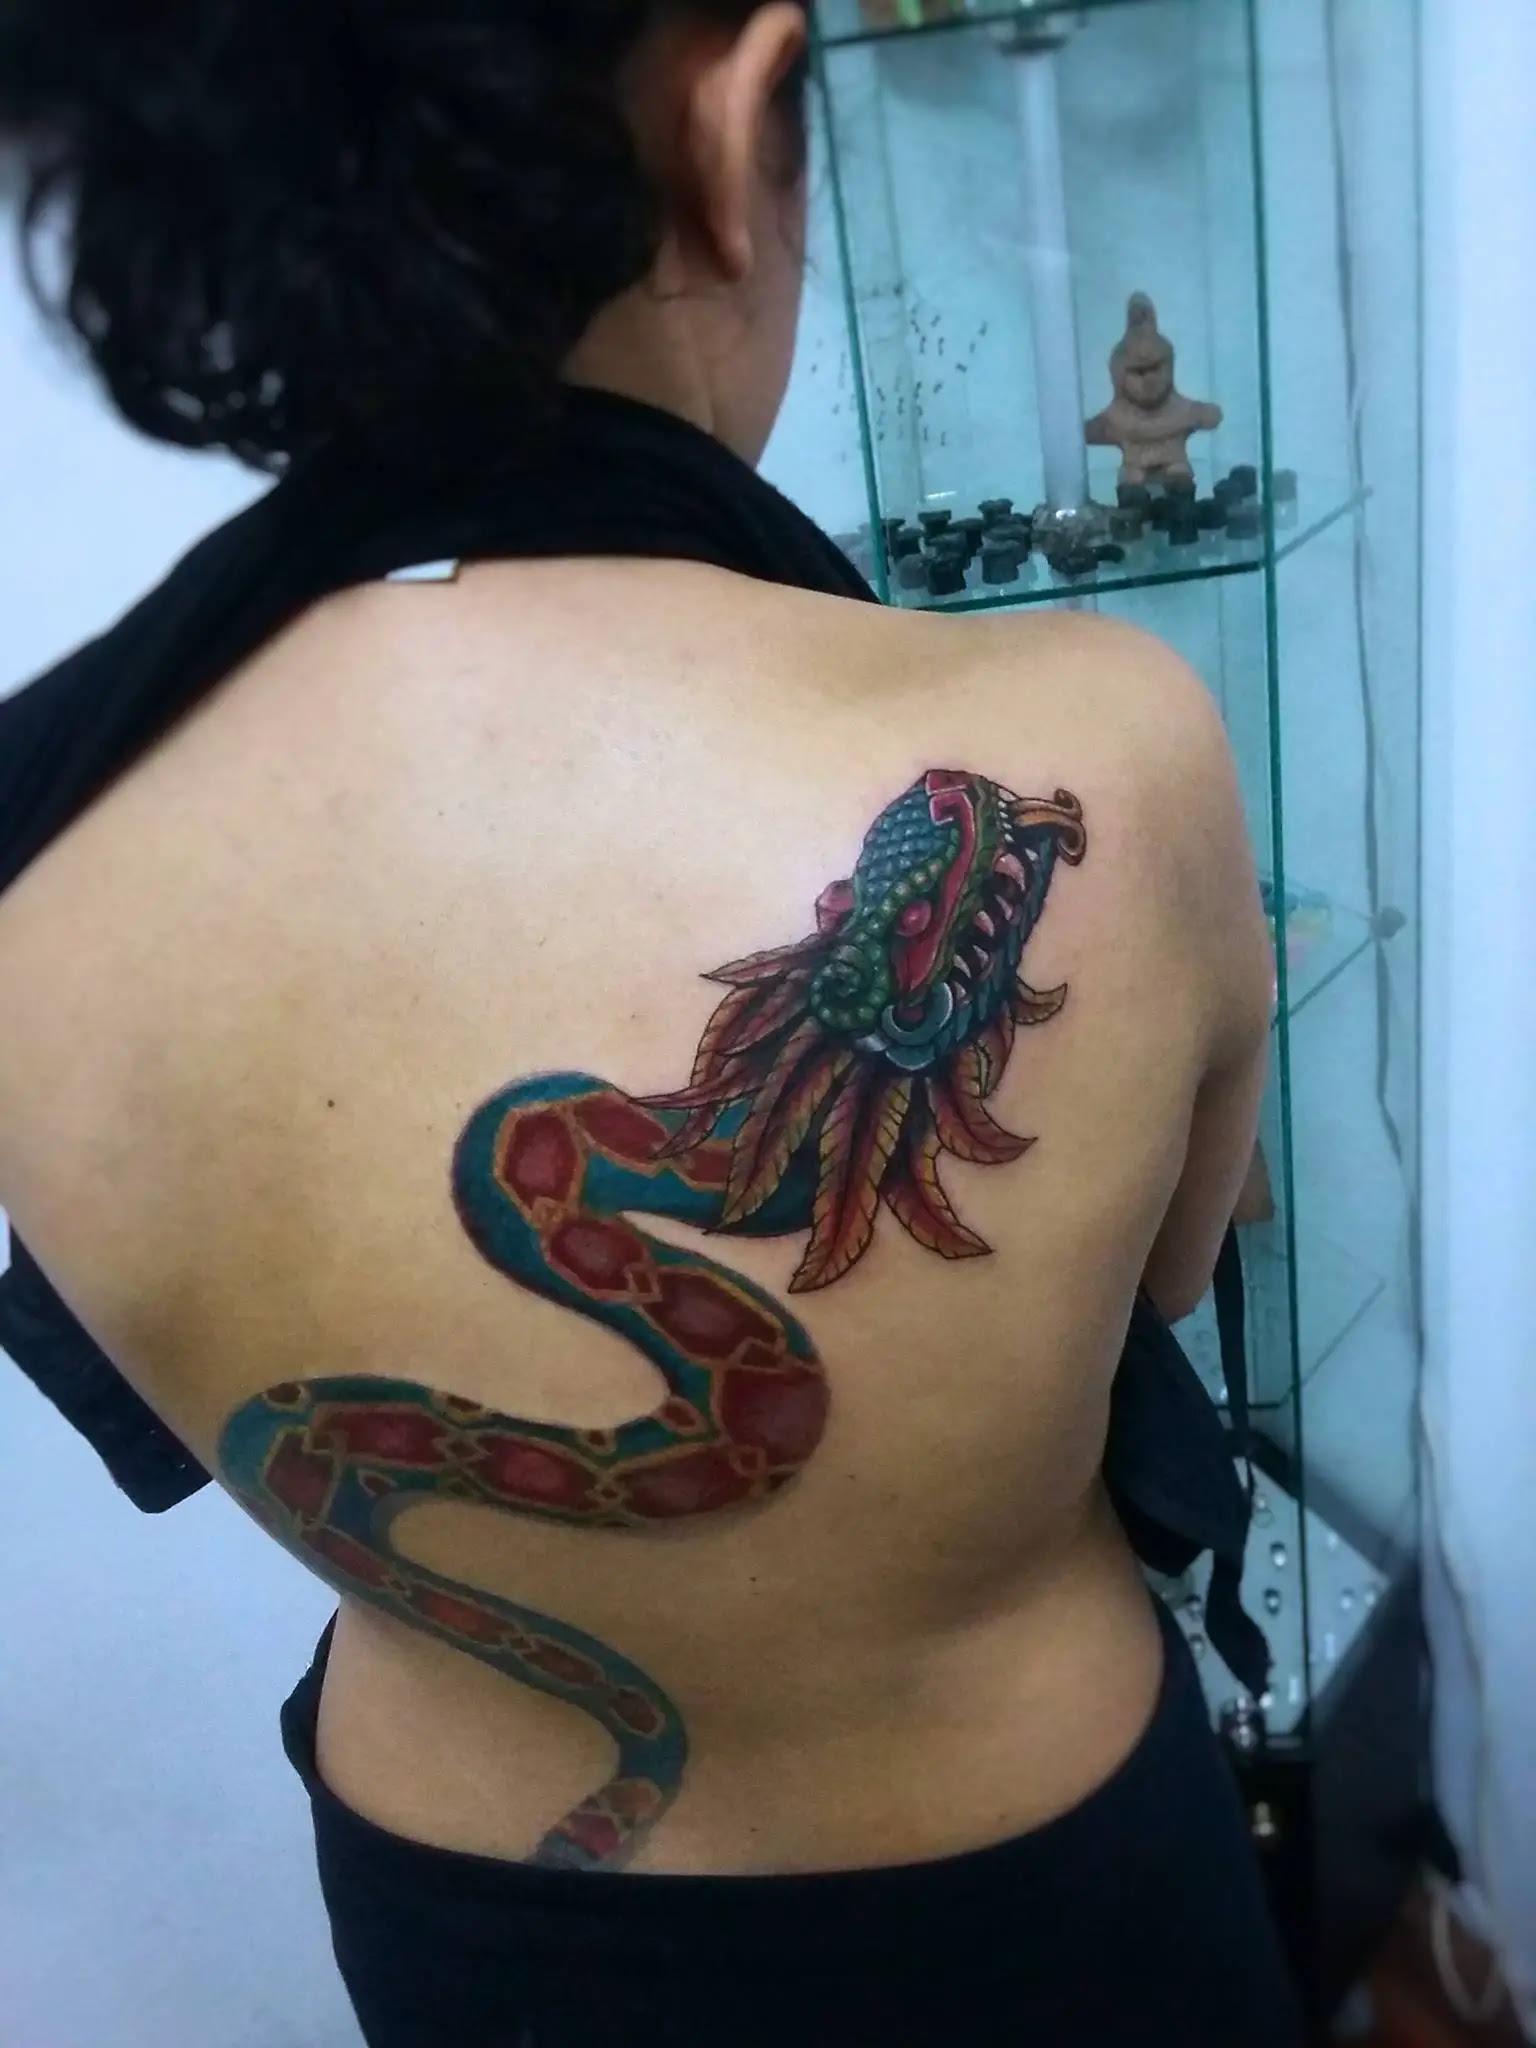 Tatuaje De La La Serpiente Emplumada Neomexicanismos